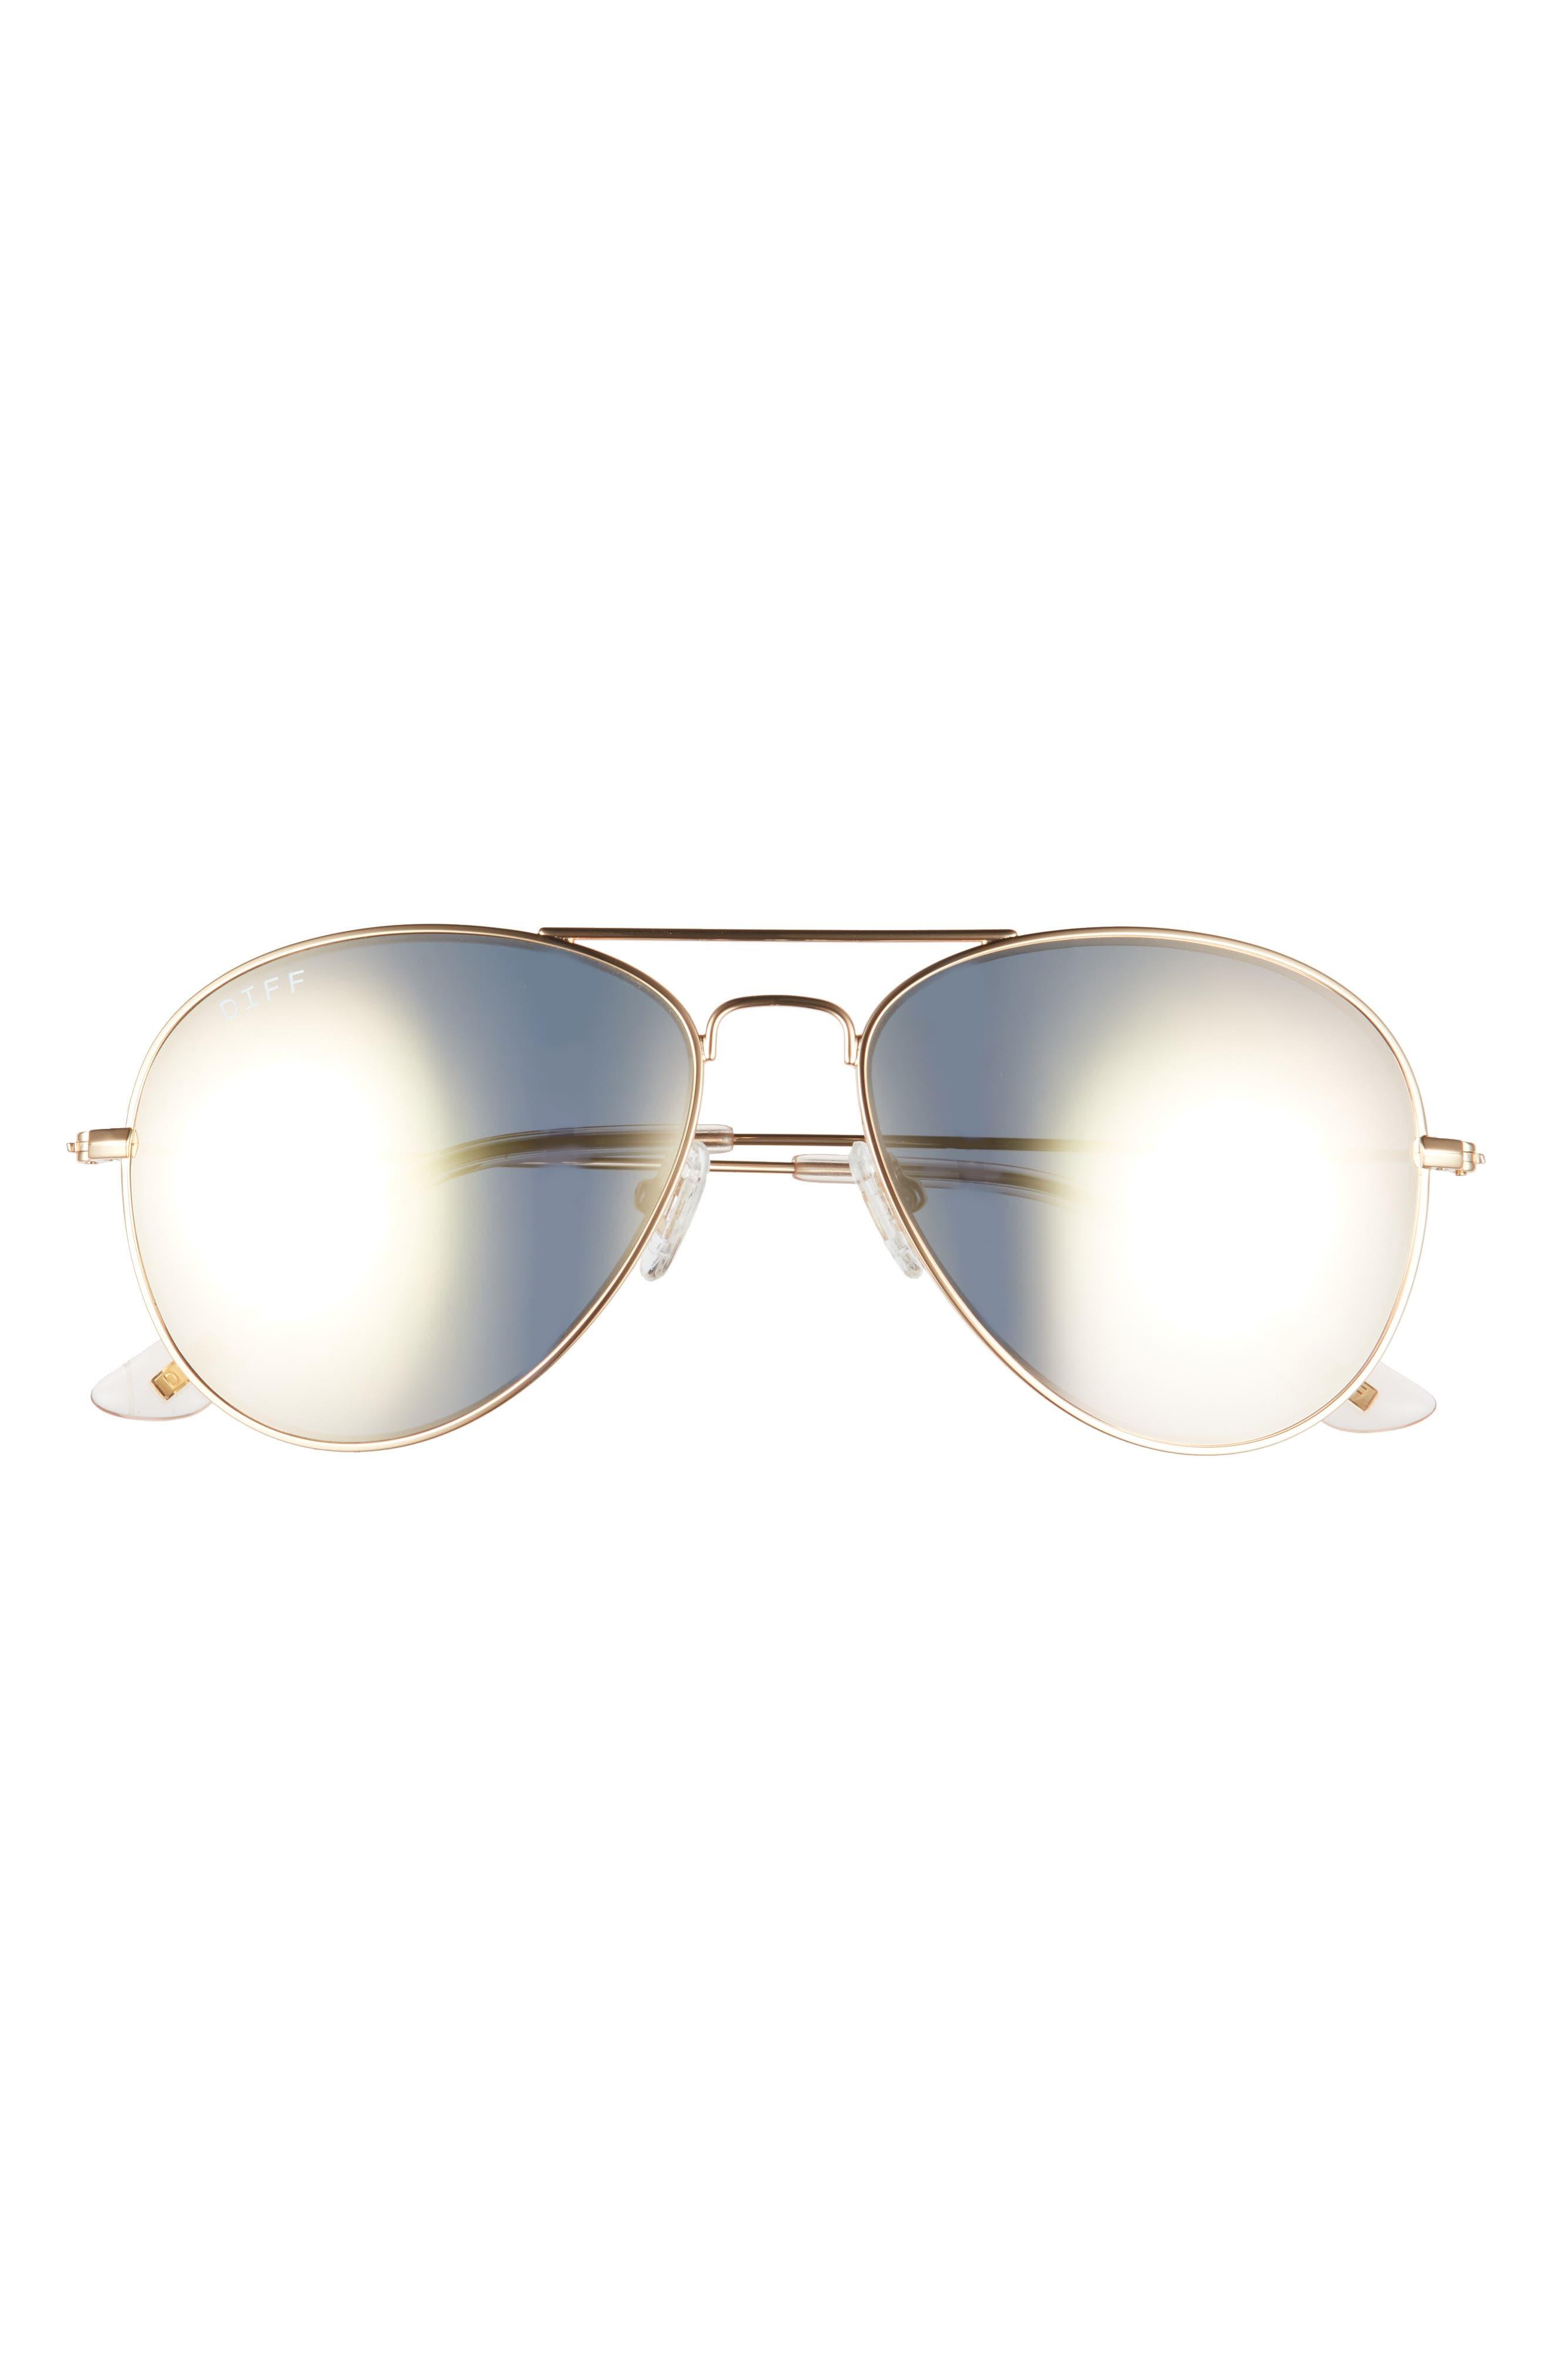 Cruz 57mm Polarized Aviator Sunglasses